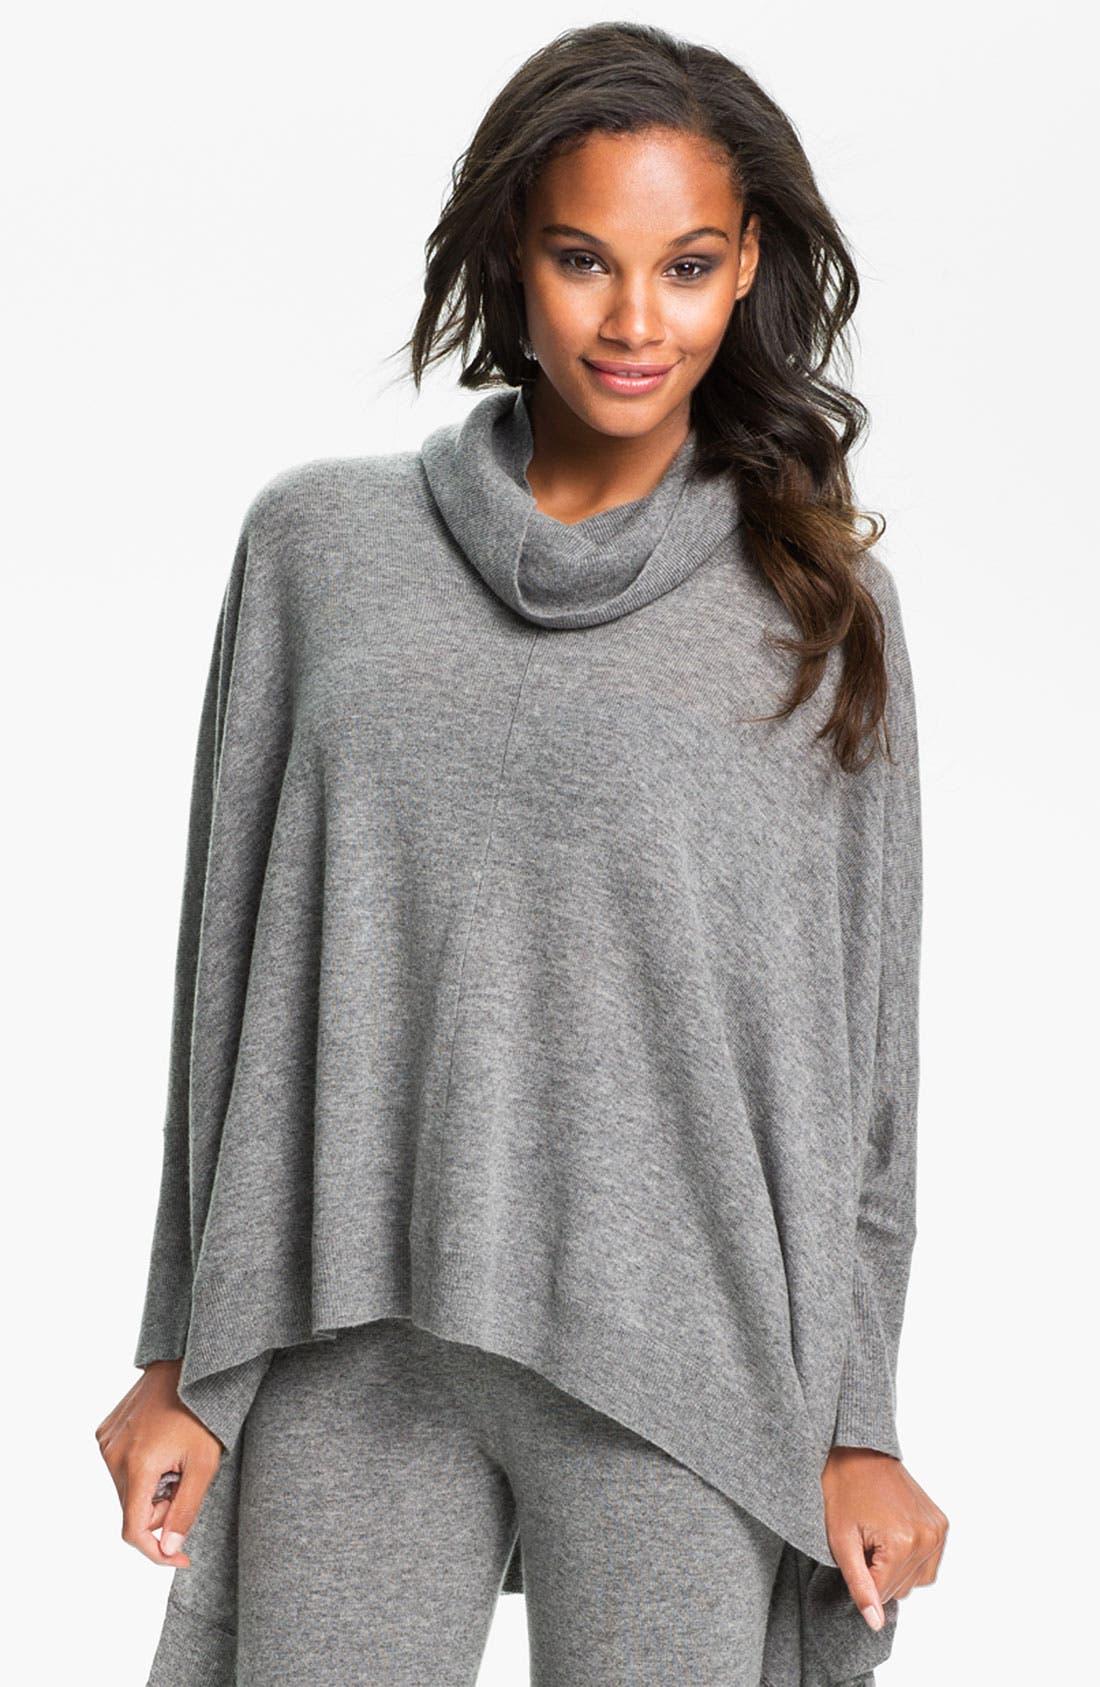 Main Image - Donna Karan 'Cozy' Sweater Knit Poncho